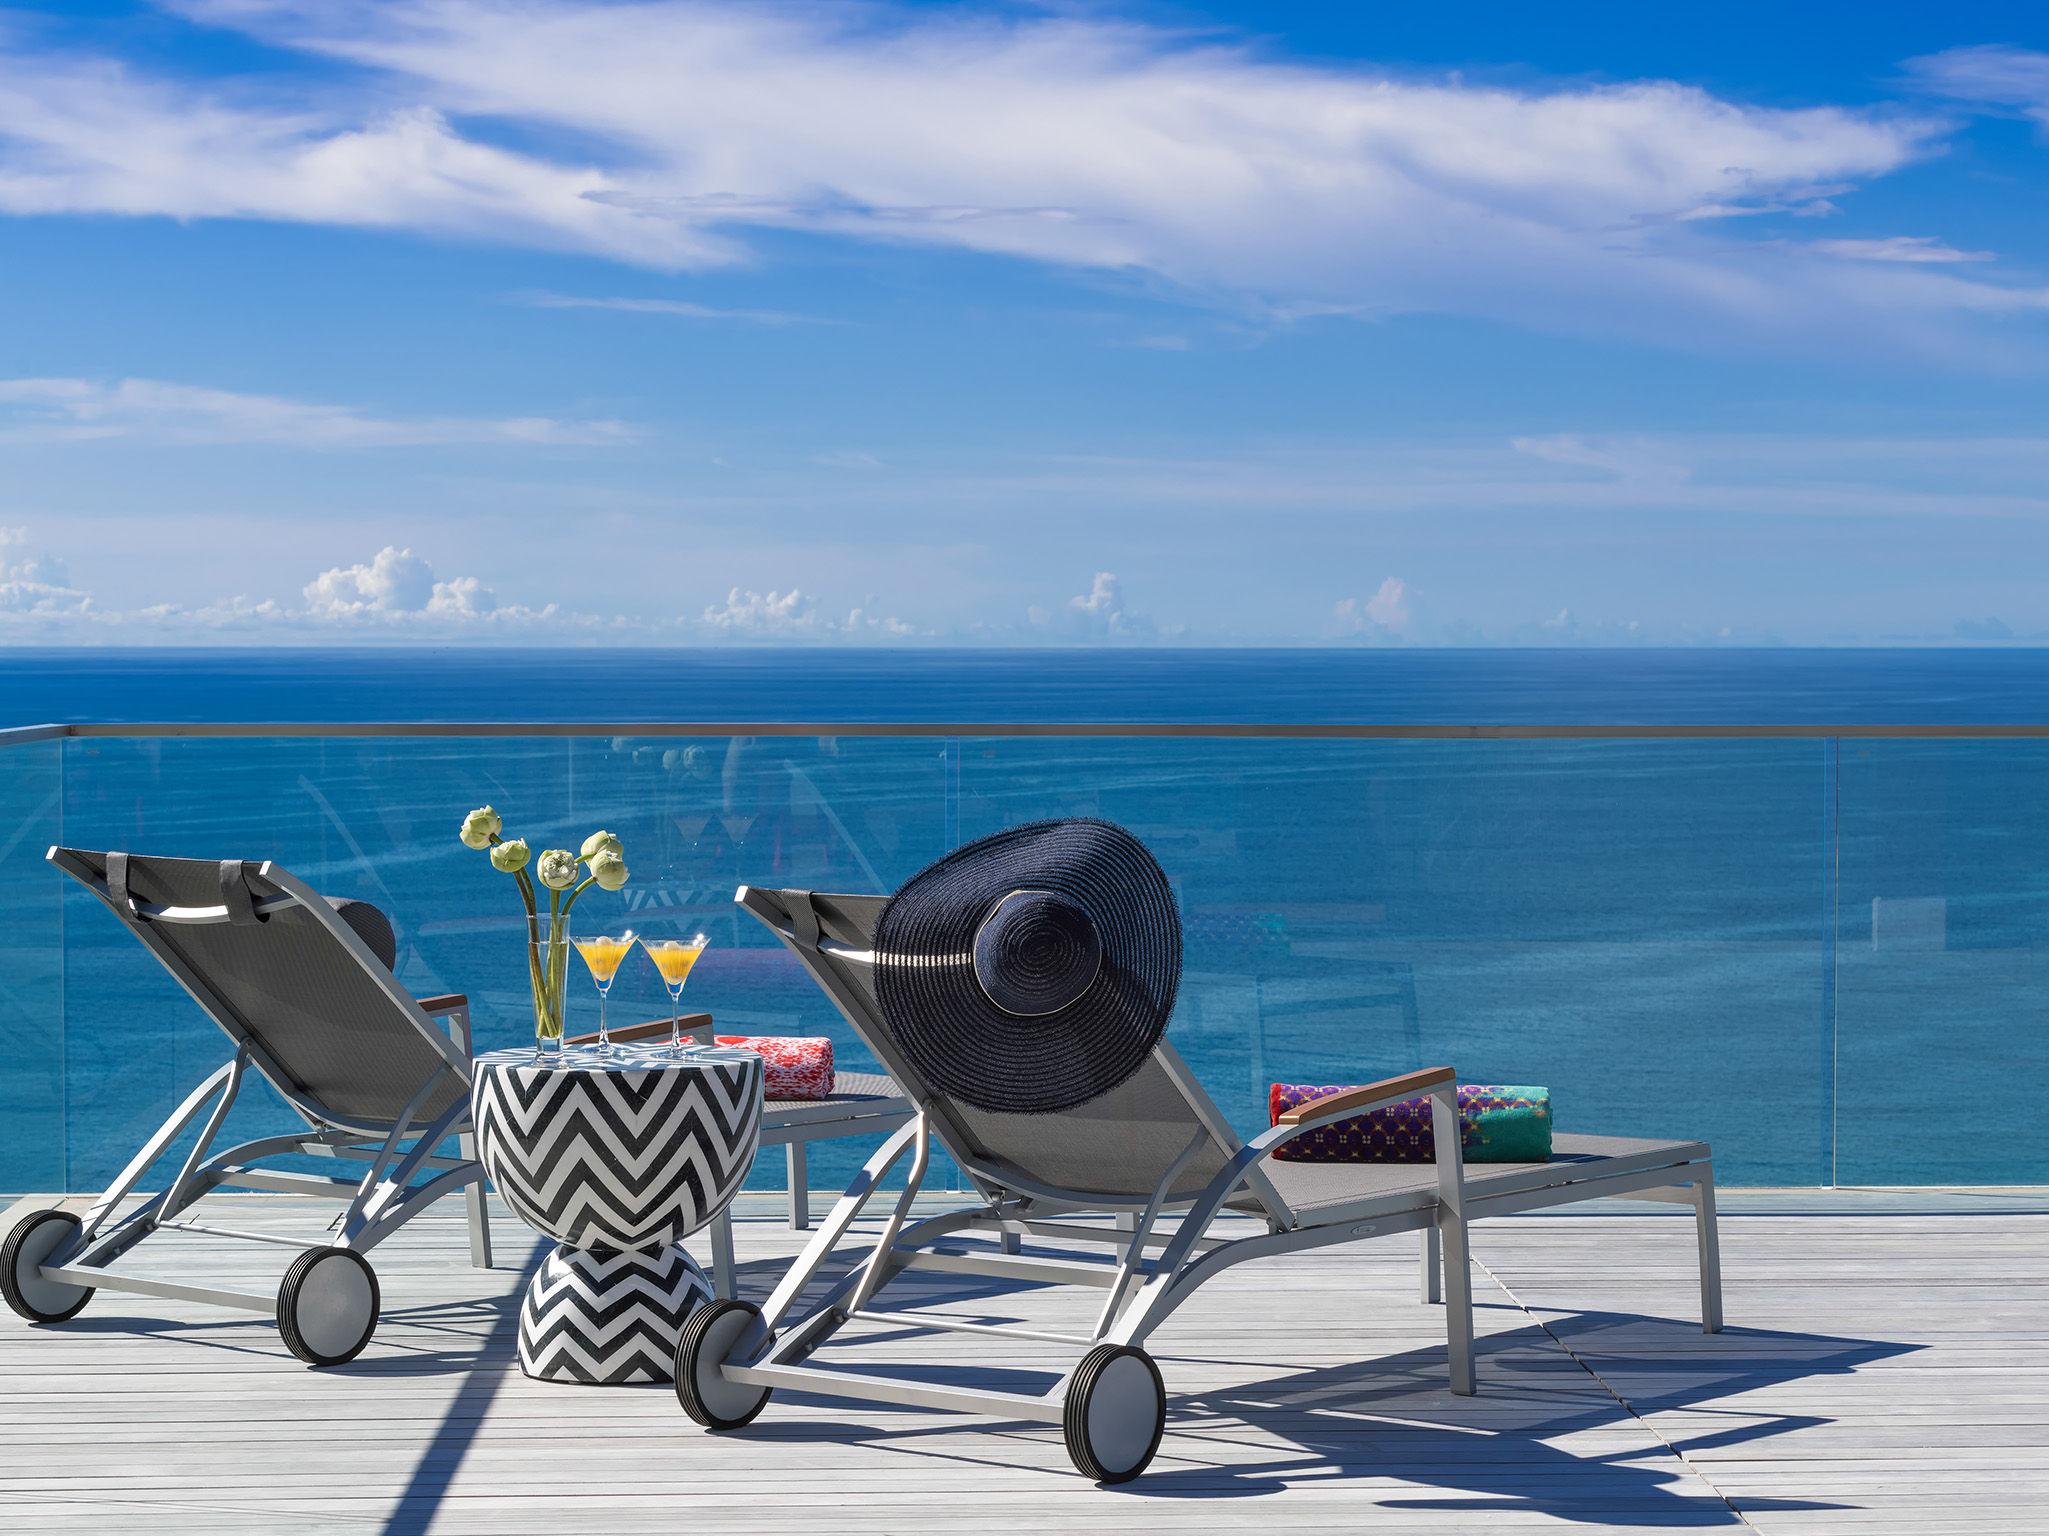 Malaiwana Villa R - Deck chairs and view